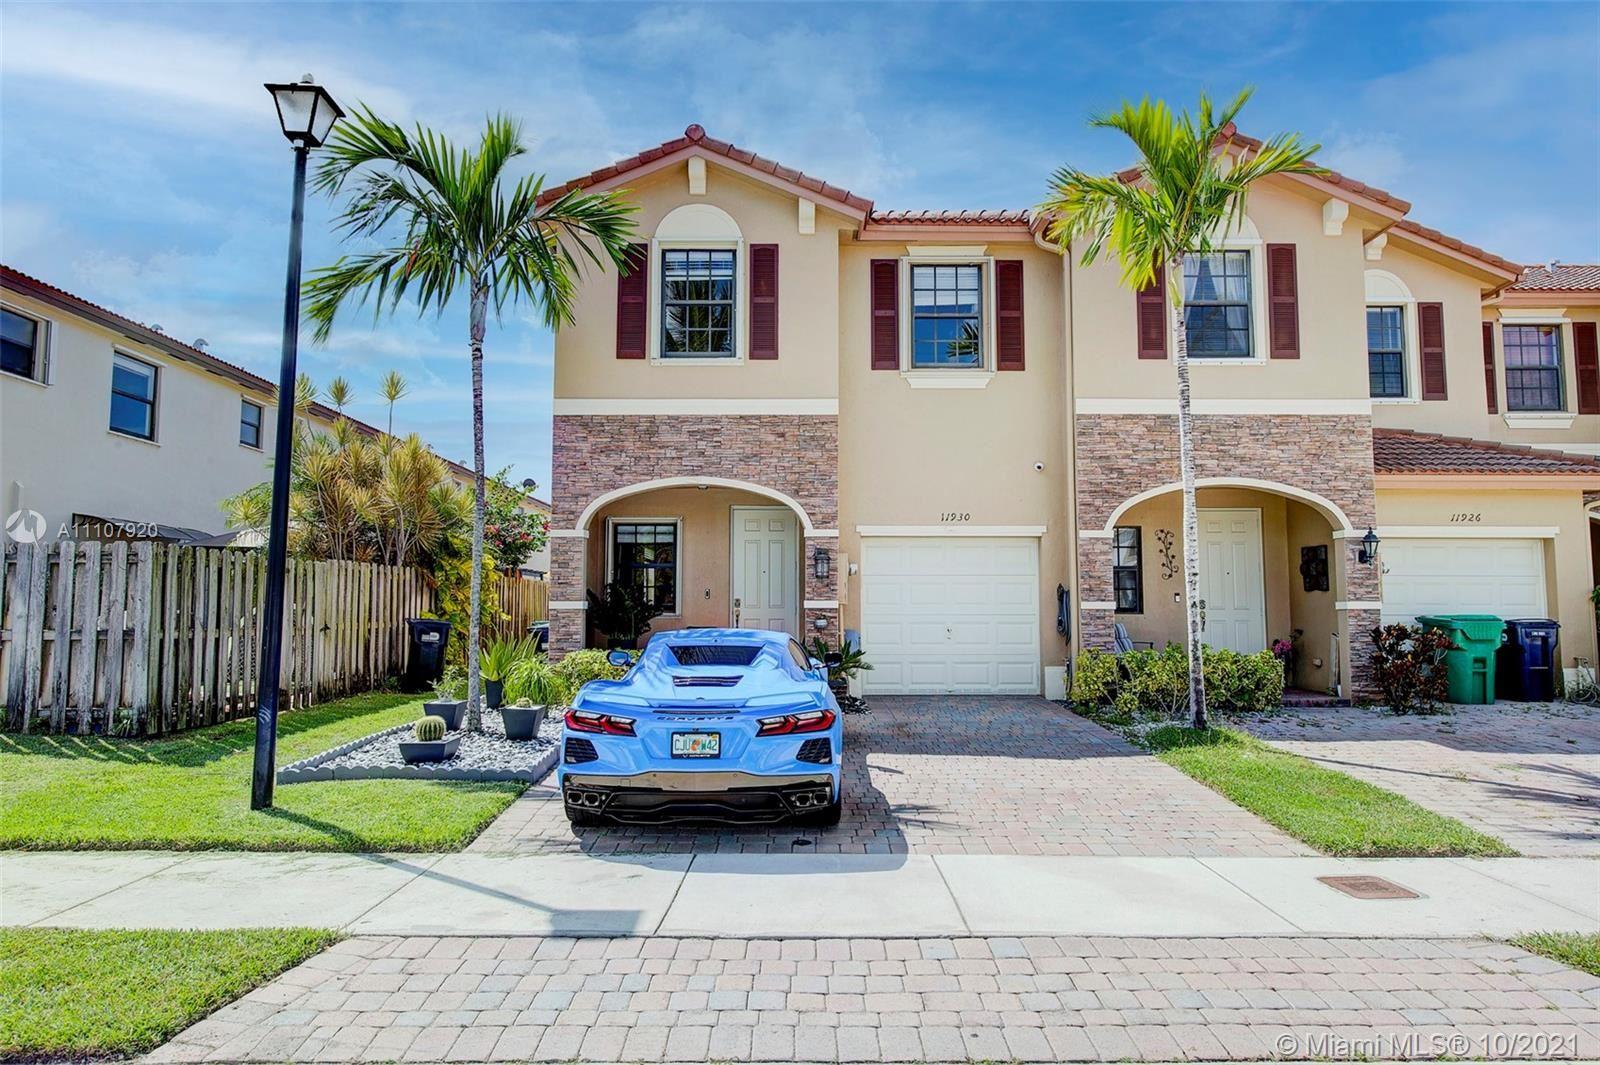 11930 SW 153rd Pl #11930, Miami, FL 33196 - #: A11107920